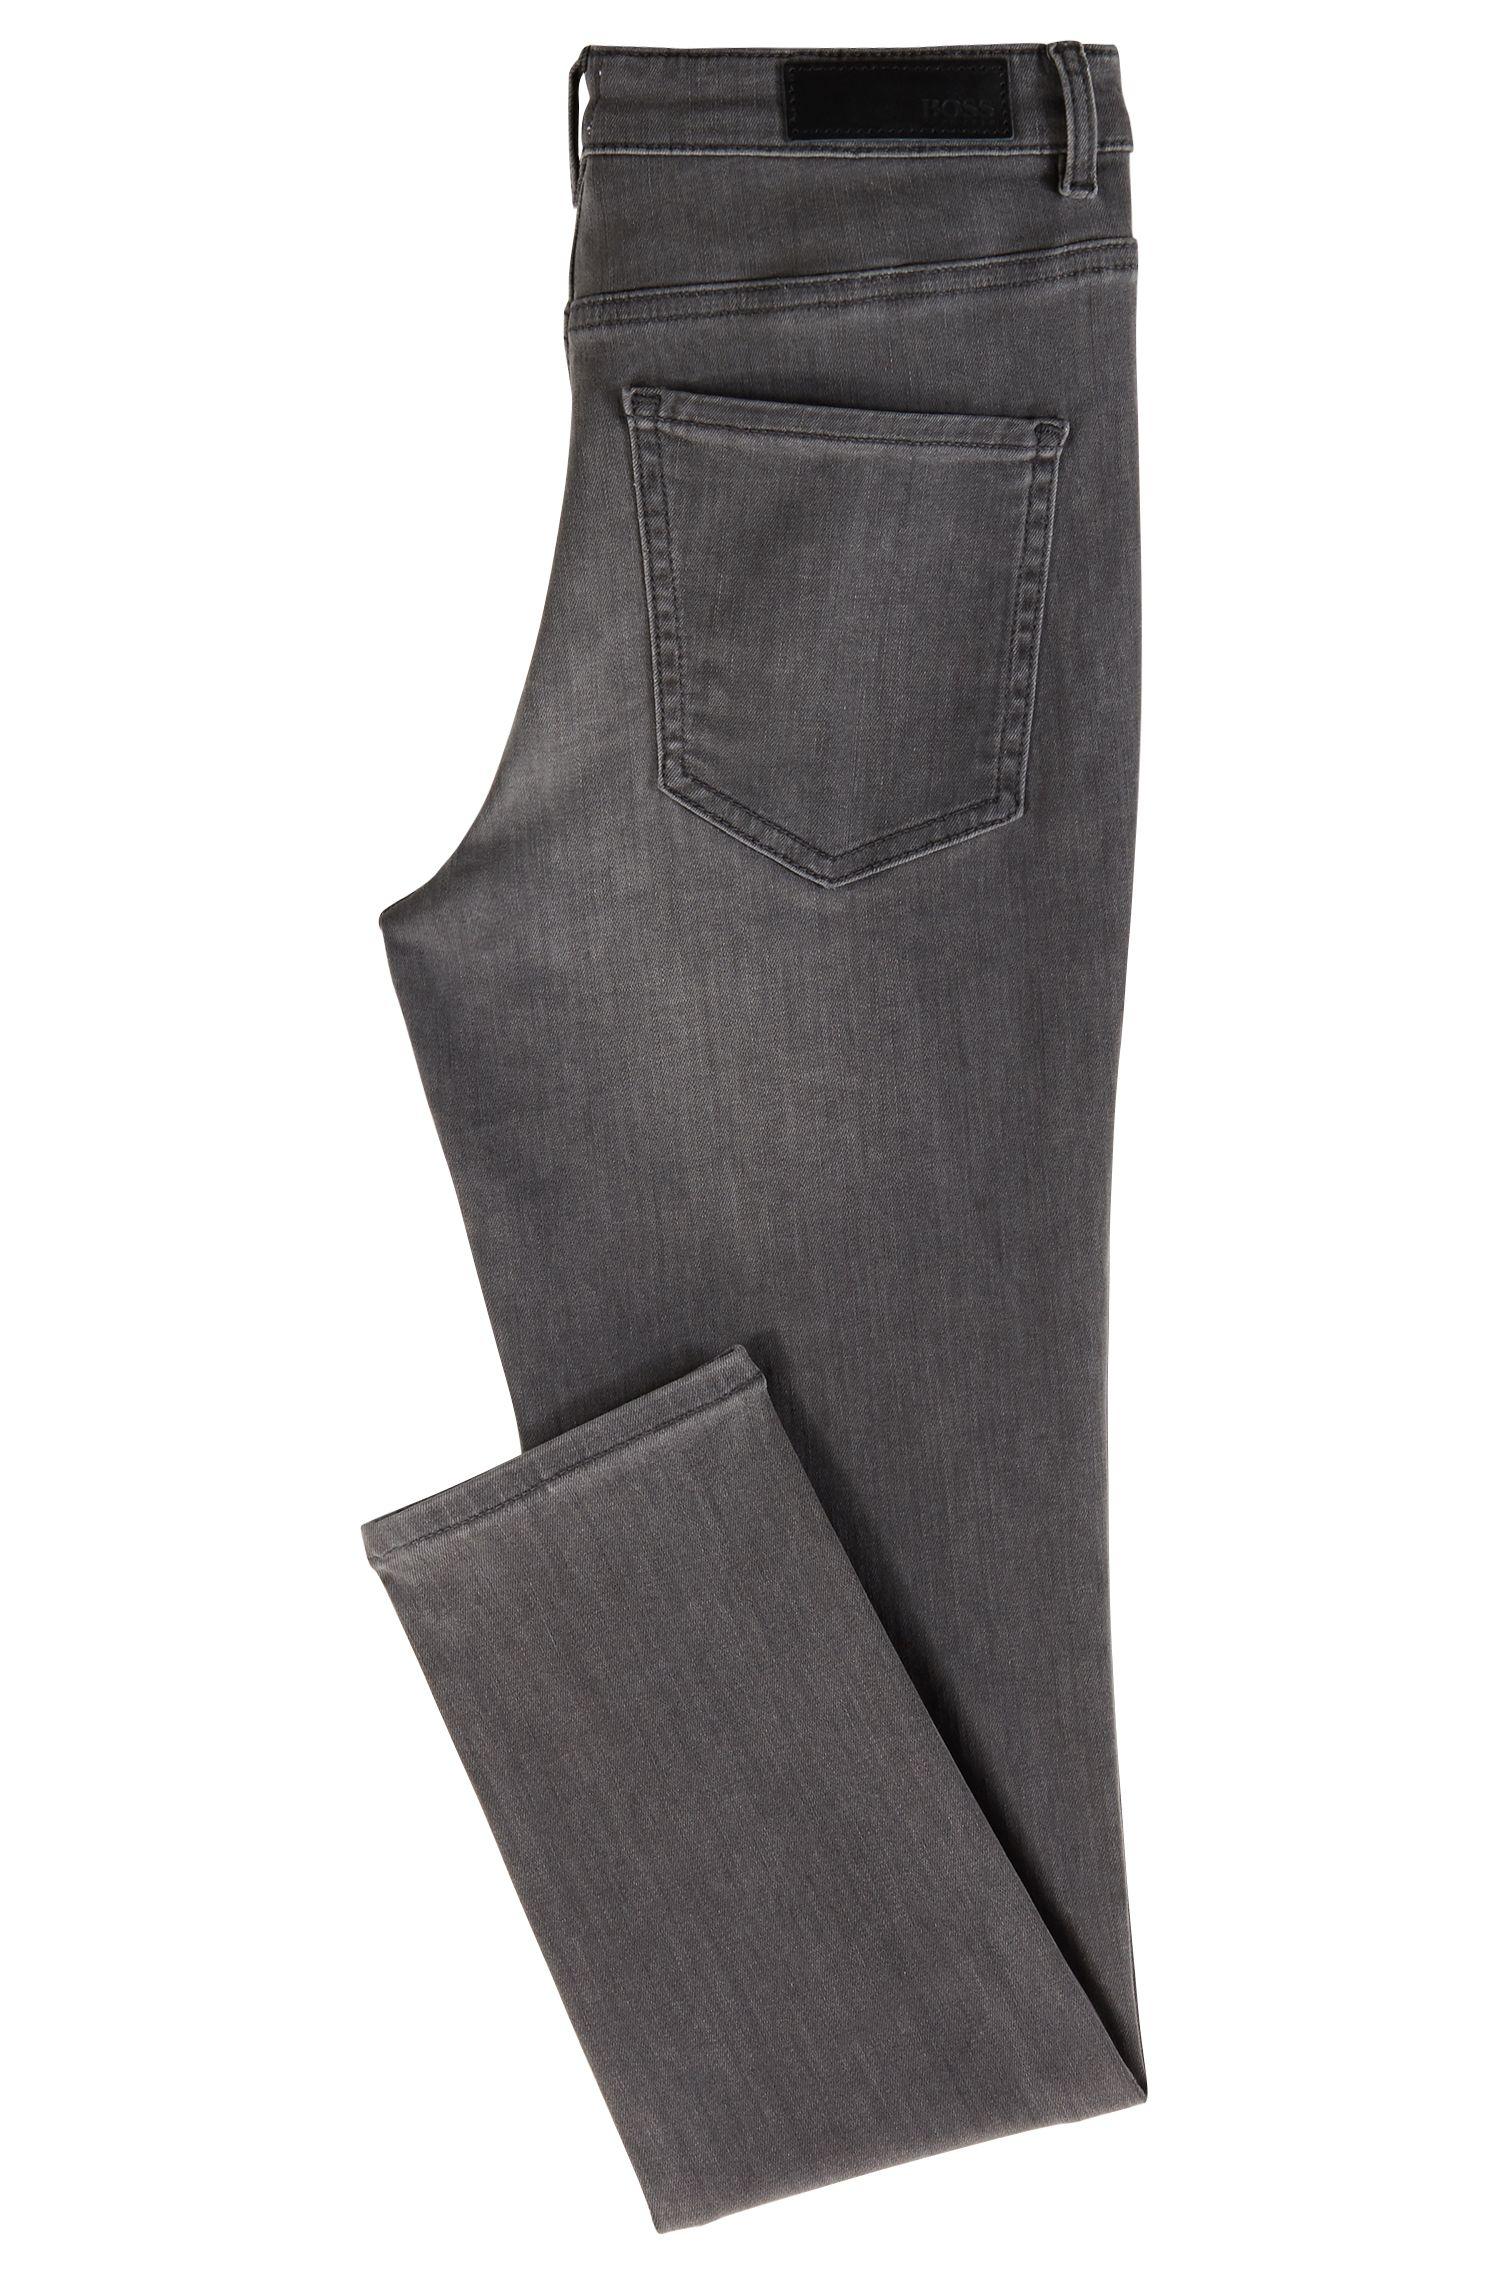 Jeans Skinny Fit en denim power-stretch gris, Gris